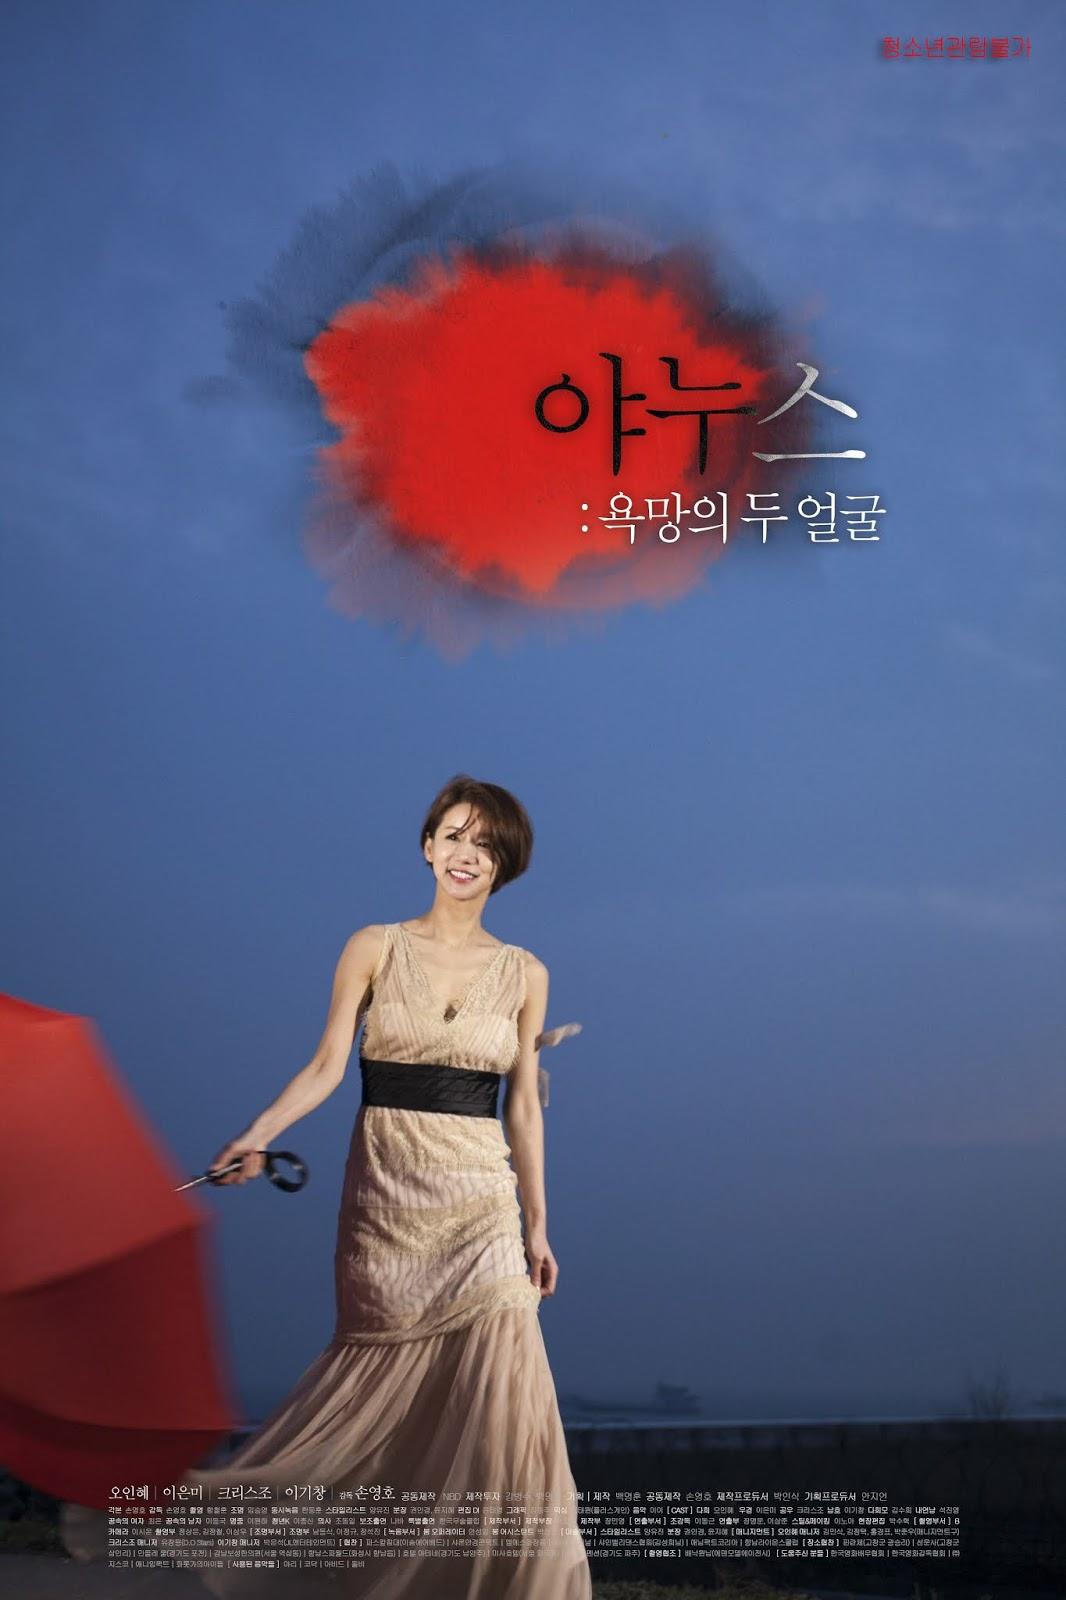 Janus Two Faces of Desire Full Korea 18+ Adult Movie Online Free